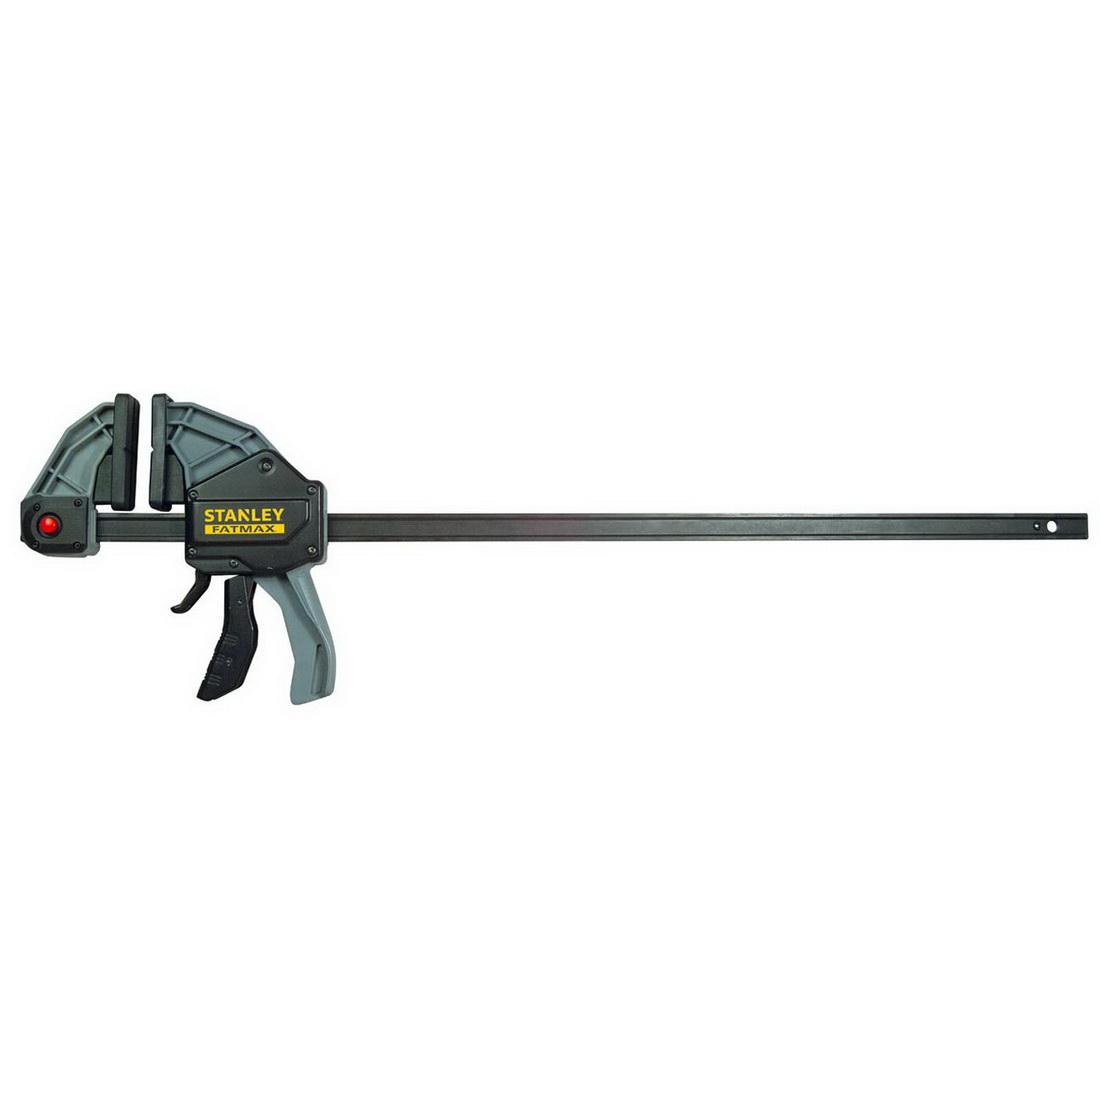 Fatmax XL 300mm x 92mm Trigger Bar Clamp